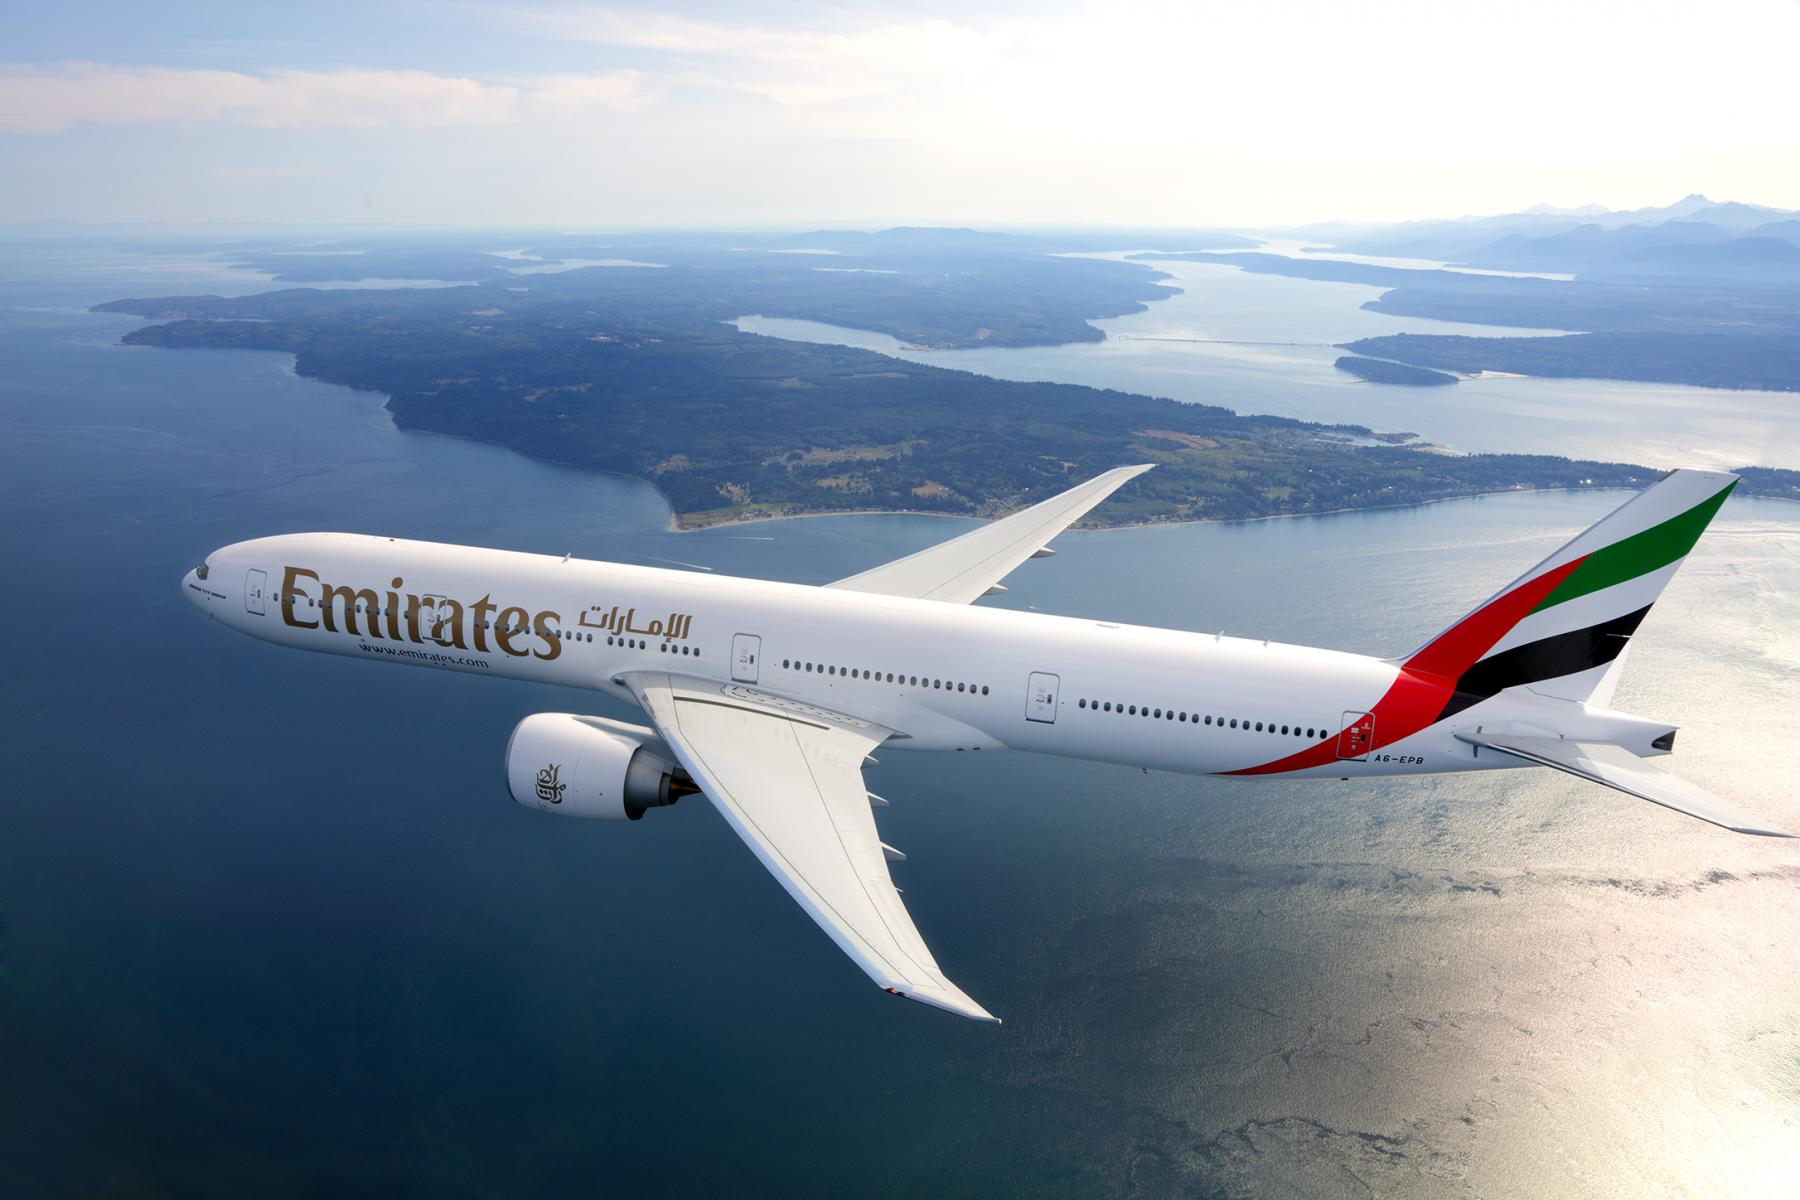 Emirates Boeing 777-300ER handout photo